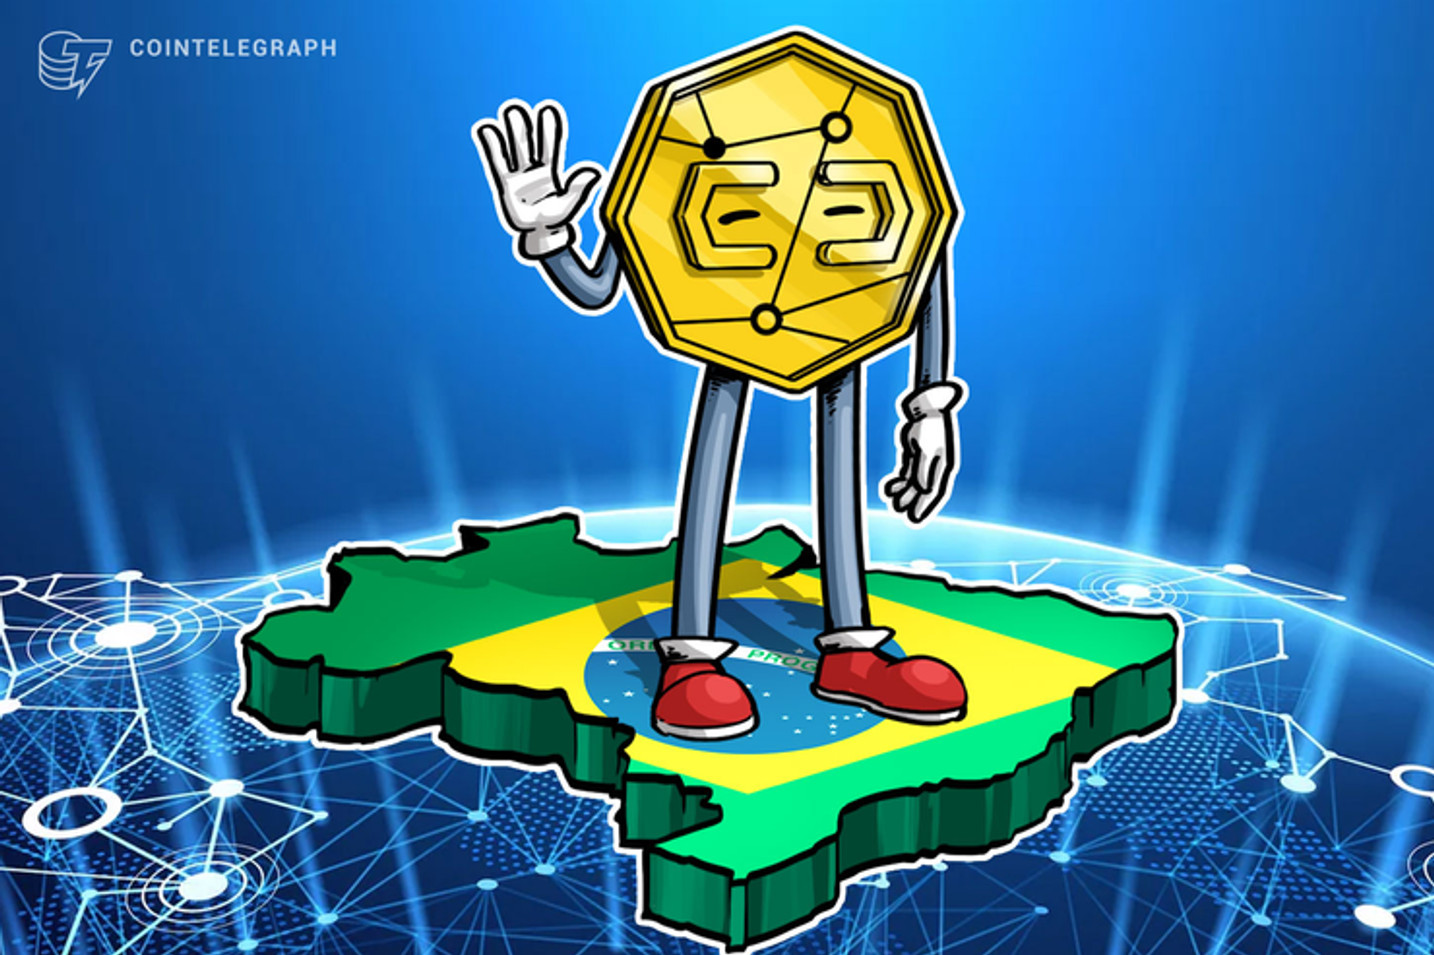 Brasileira BLP criou fundo com Bitcoin e criptomoedas regularizado pela CVM e destinado a investidores do varejo